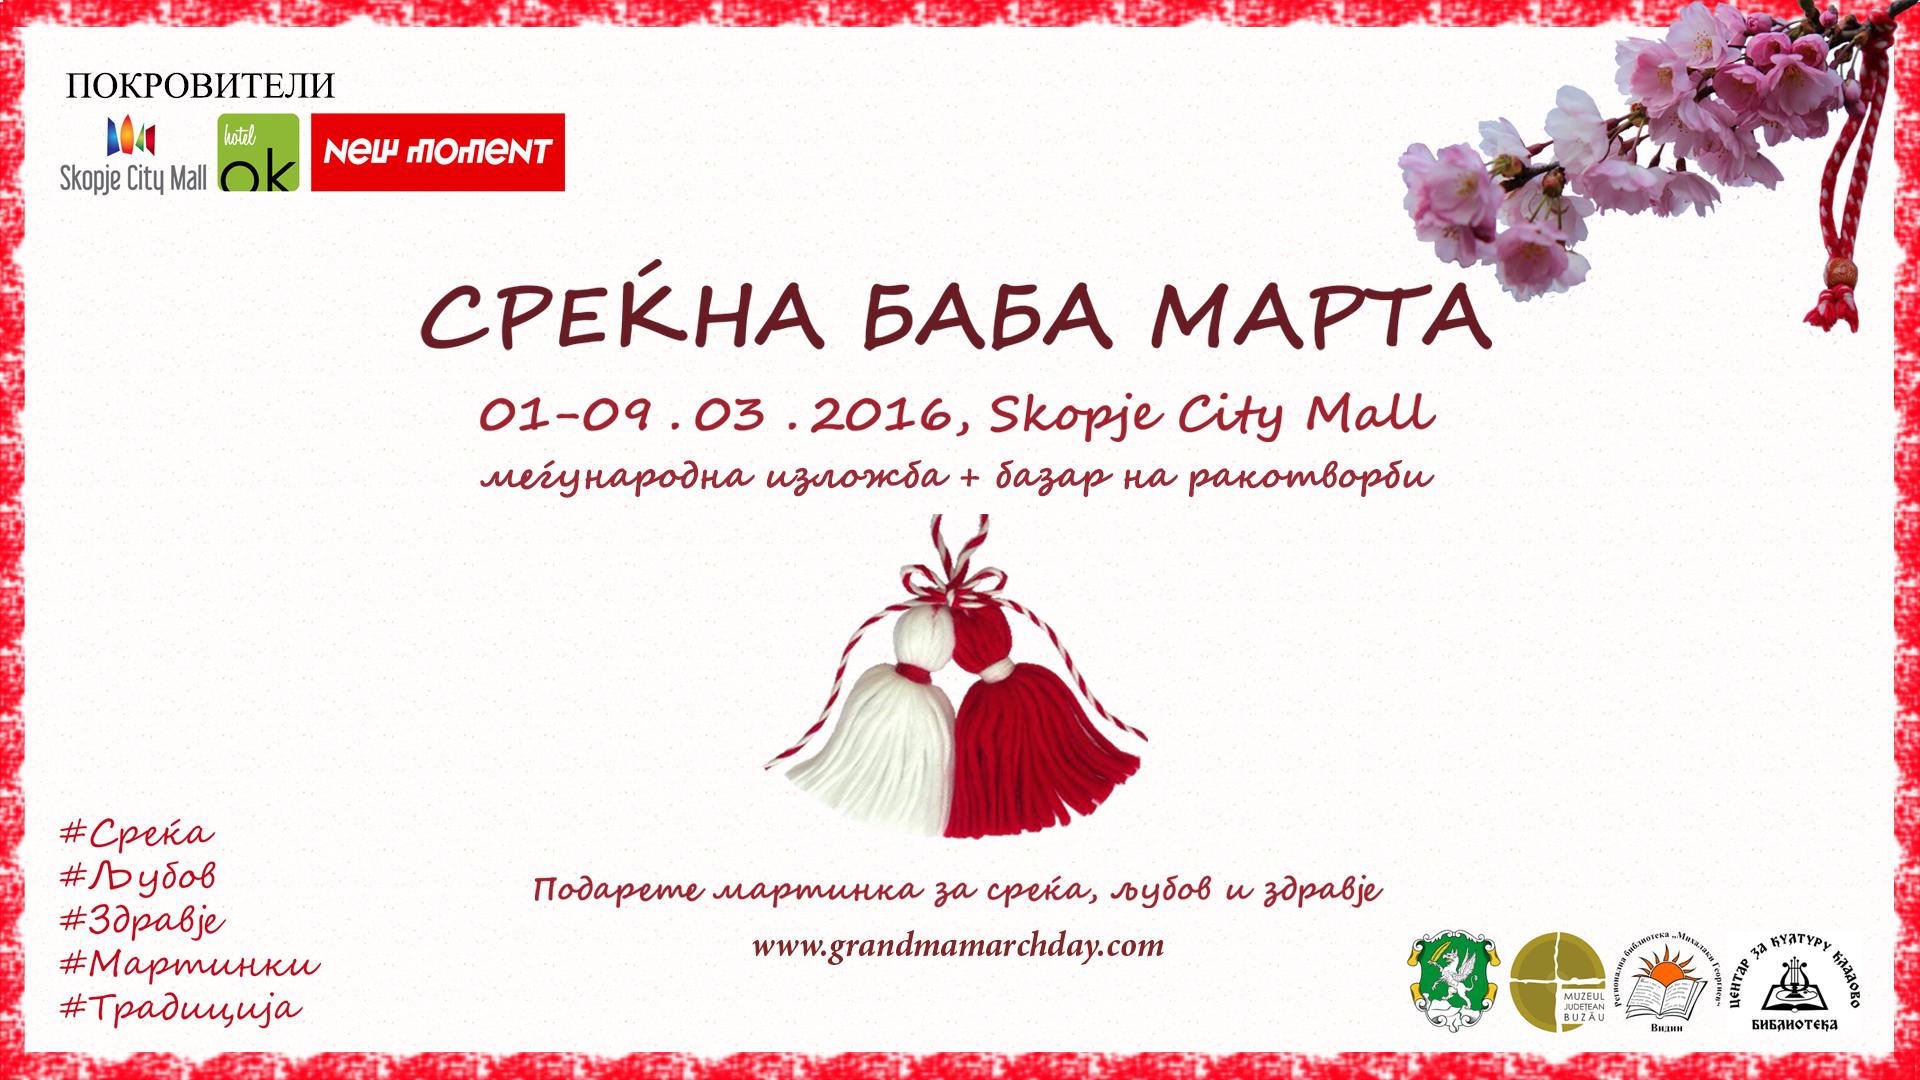 HAEMUS_LCD display - horizontal_Skopje_exhibition_martinki